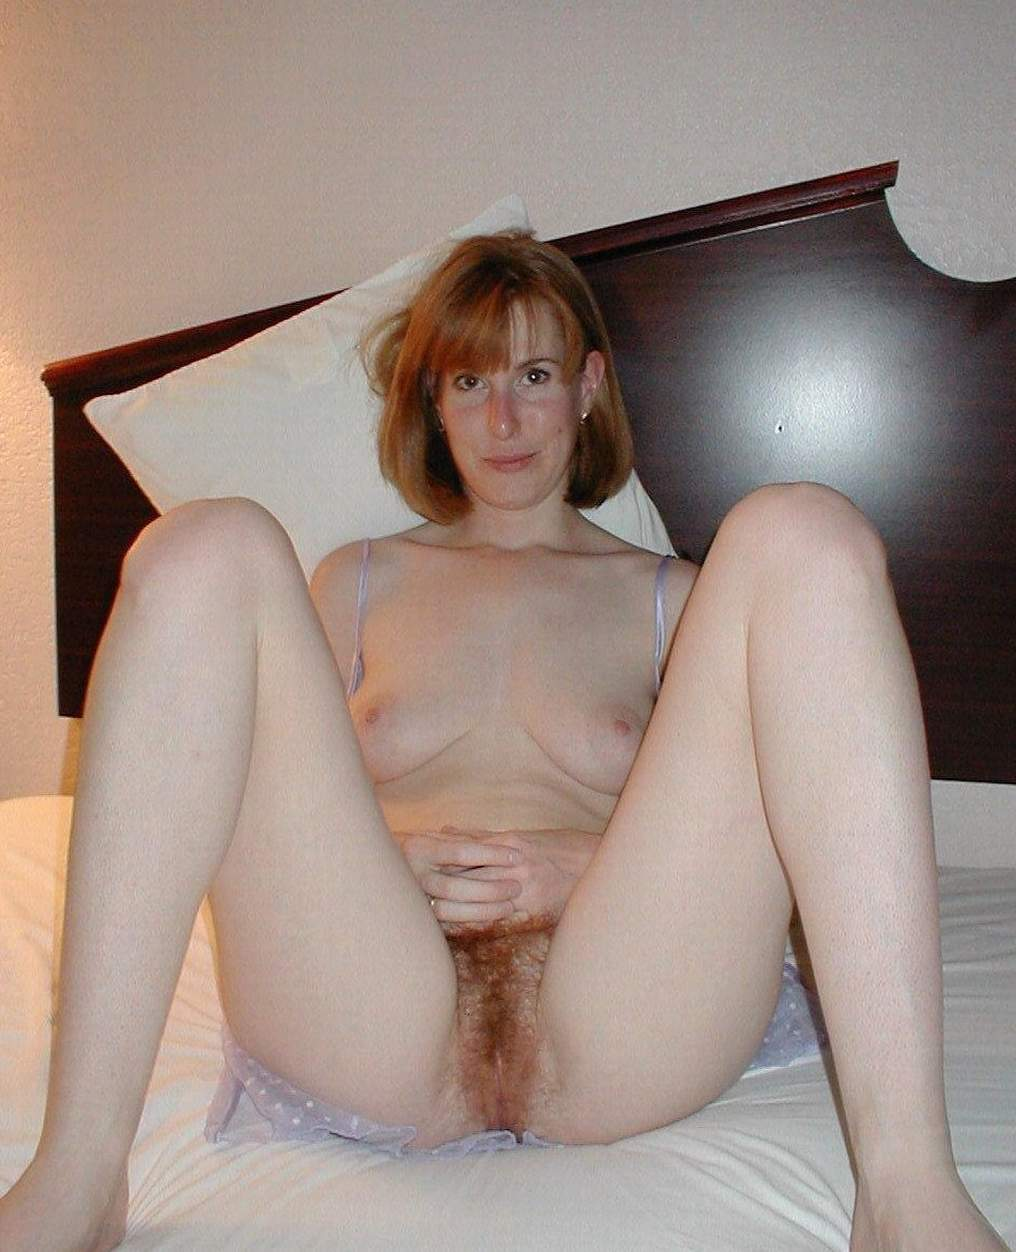 Morning blowjob amateur amature porn girls